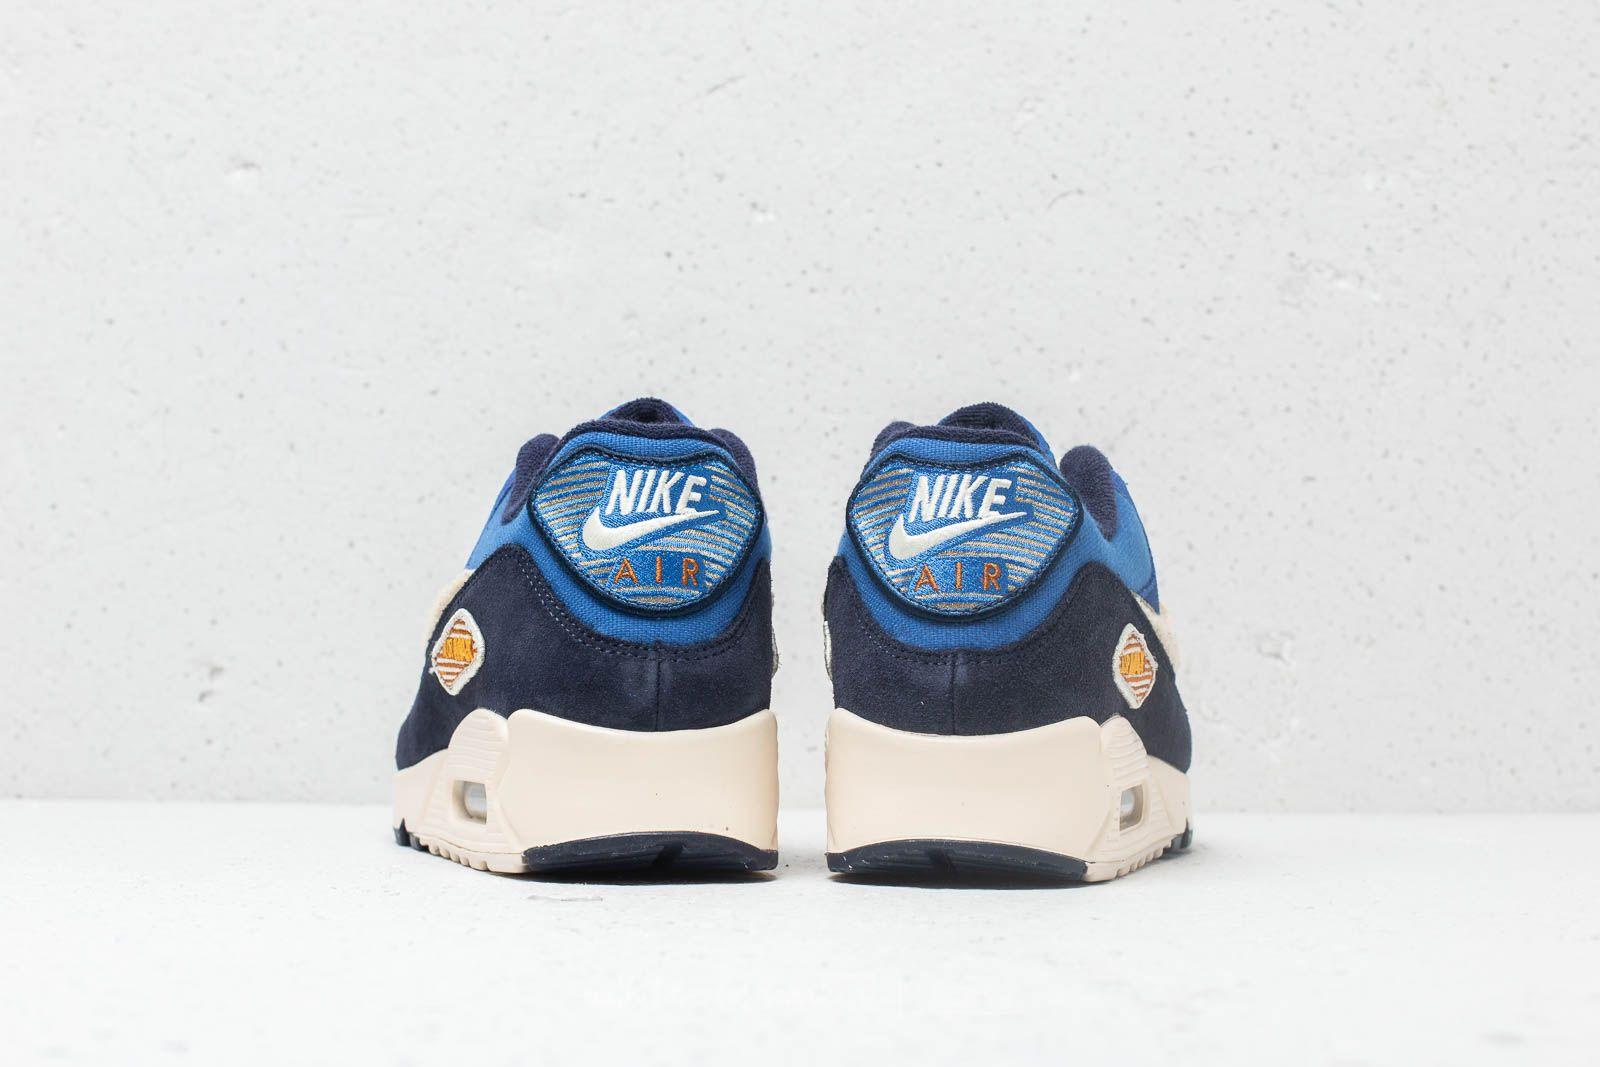 Nike Air Max 90 Premium SE Game Royal Light Cream | Footshop